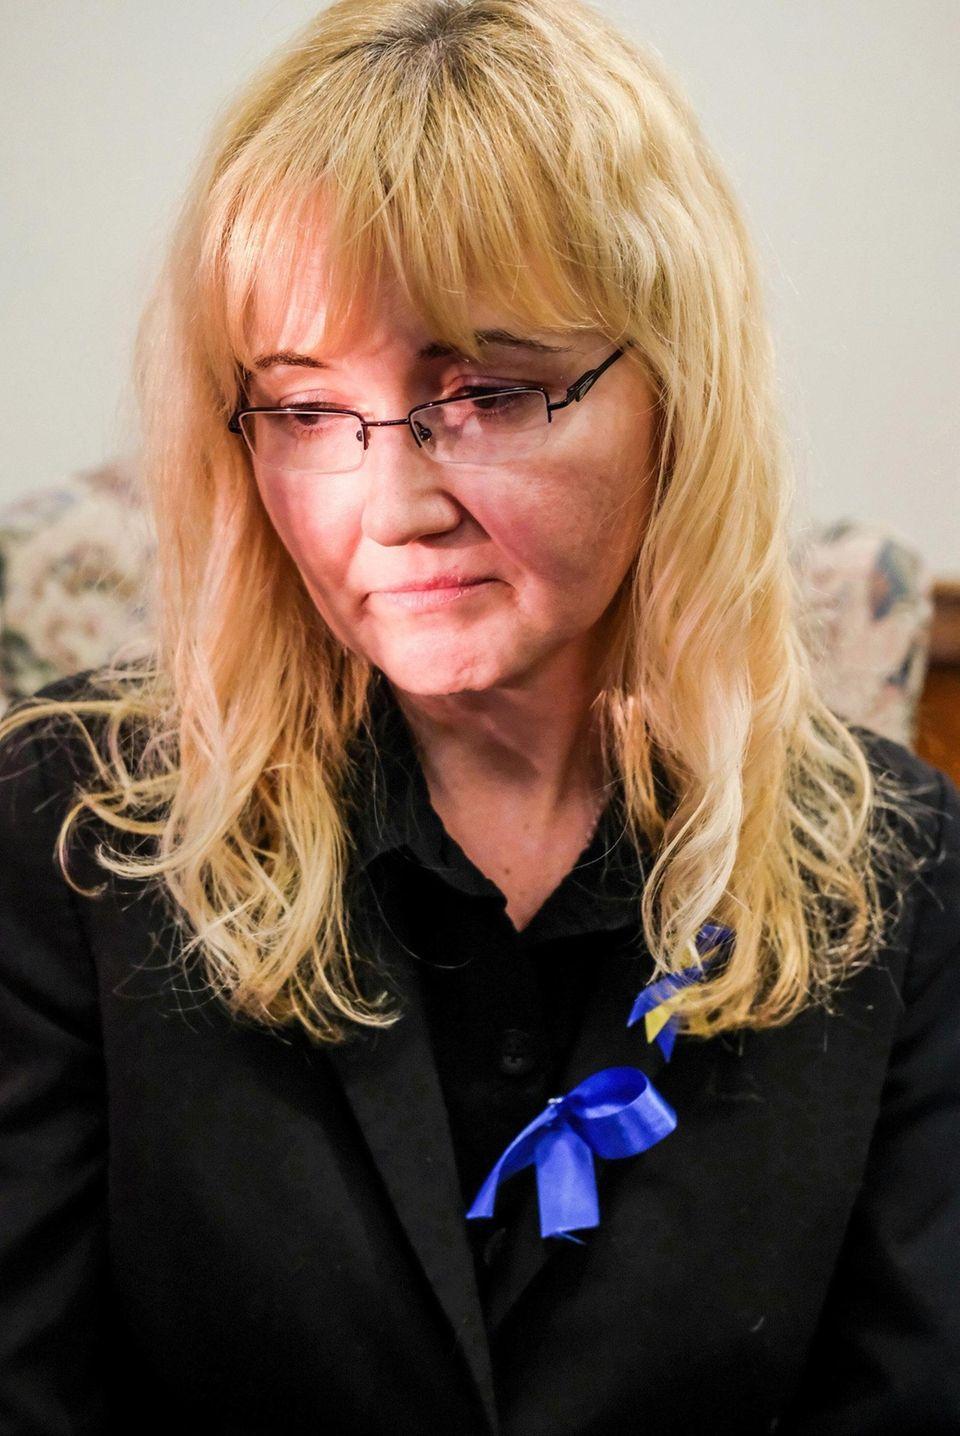 Justyna Zubko-Valva speaks during the wake for her